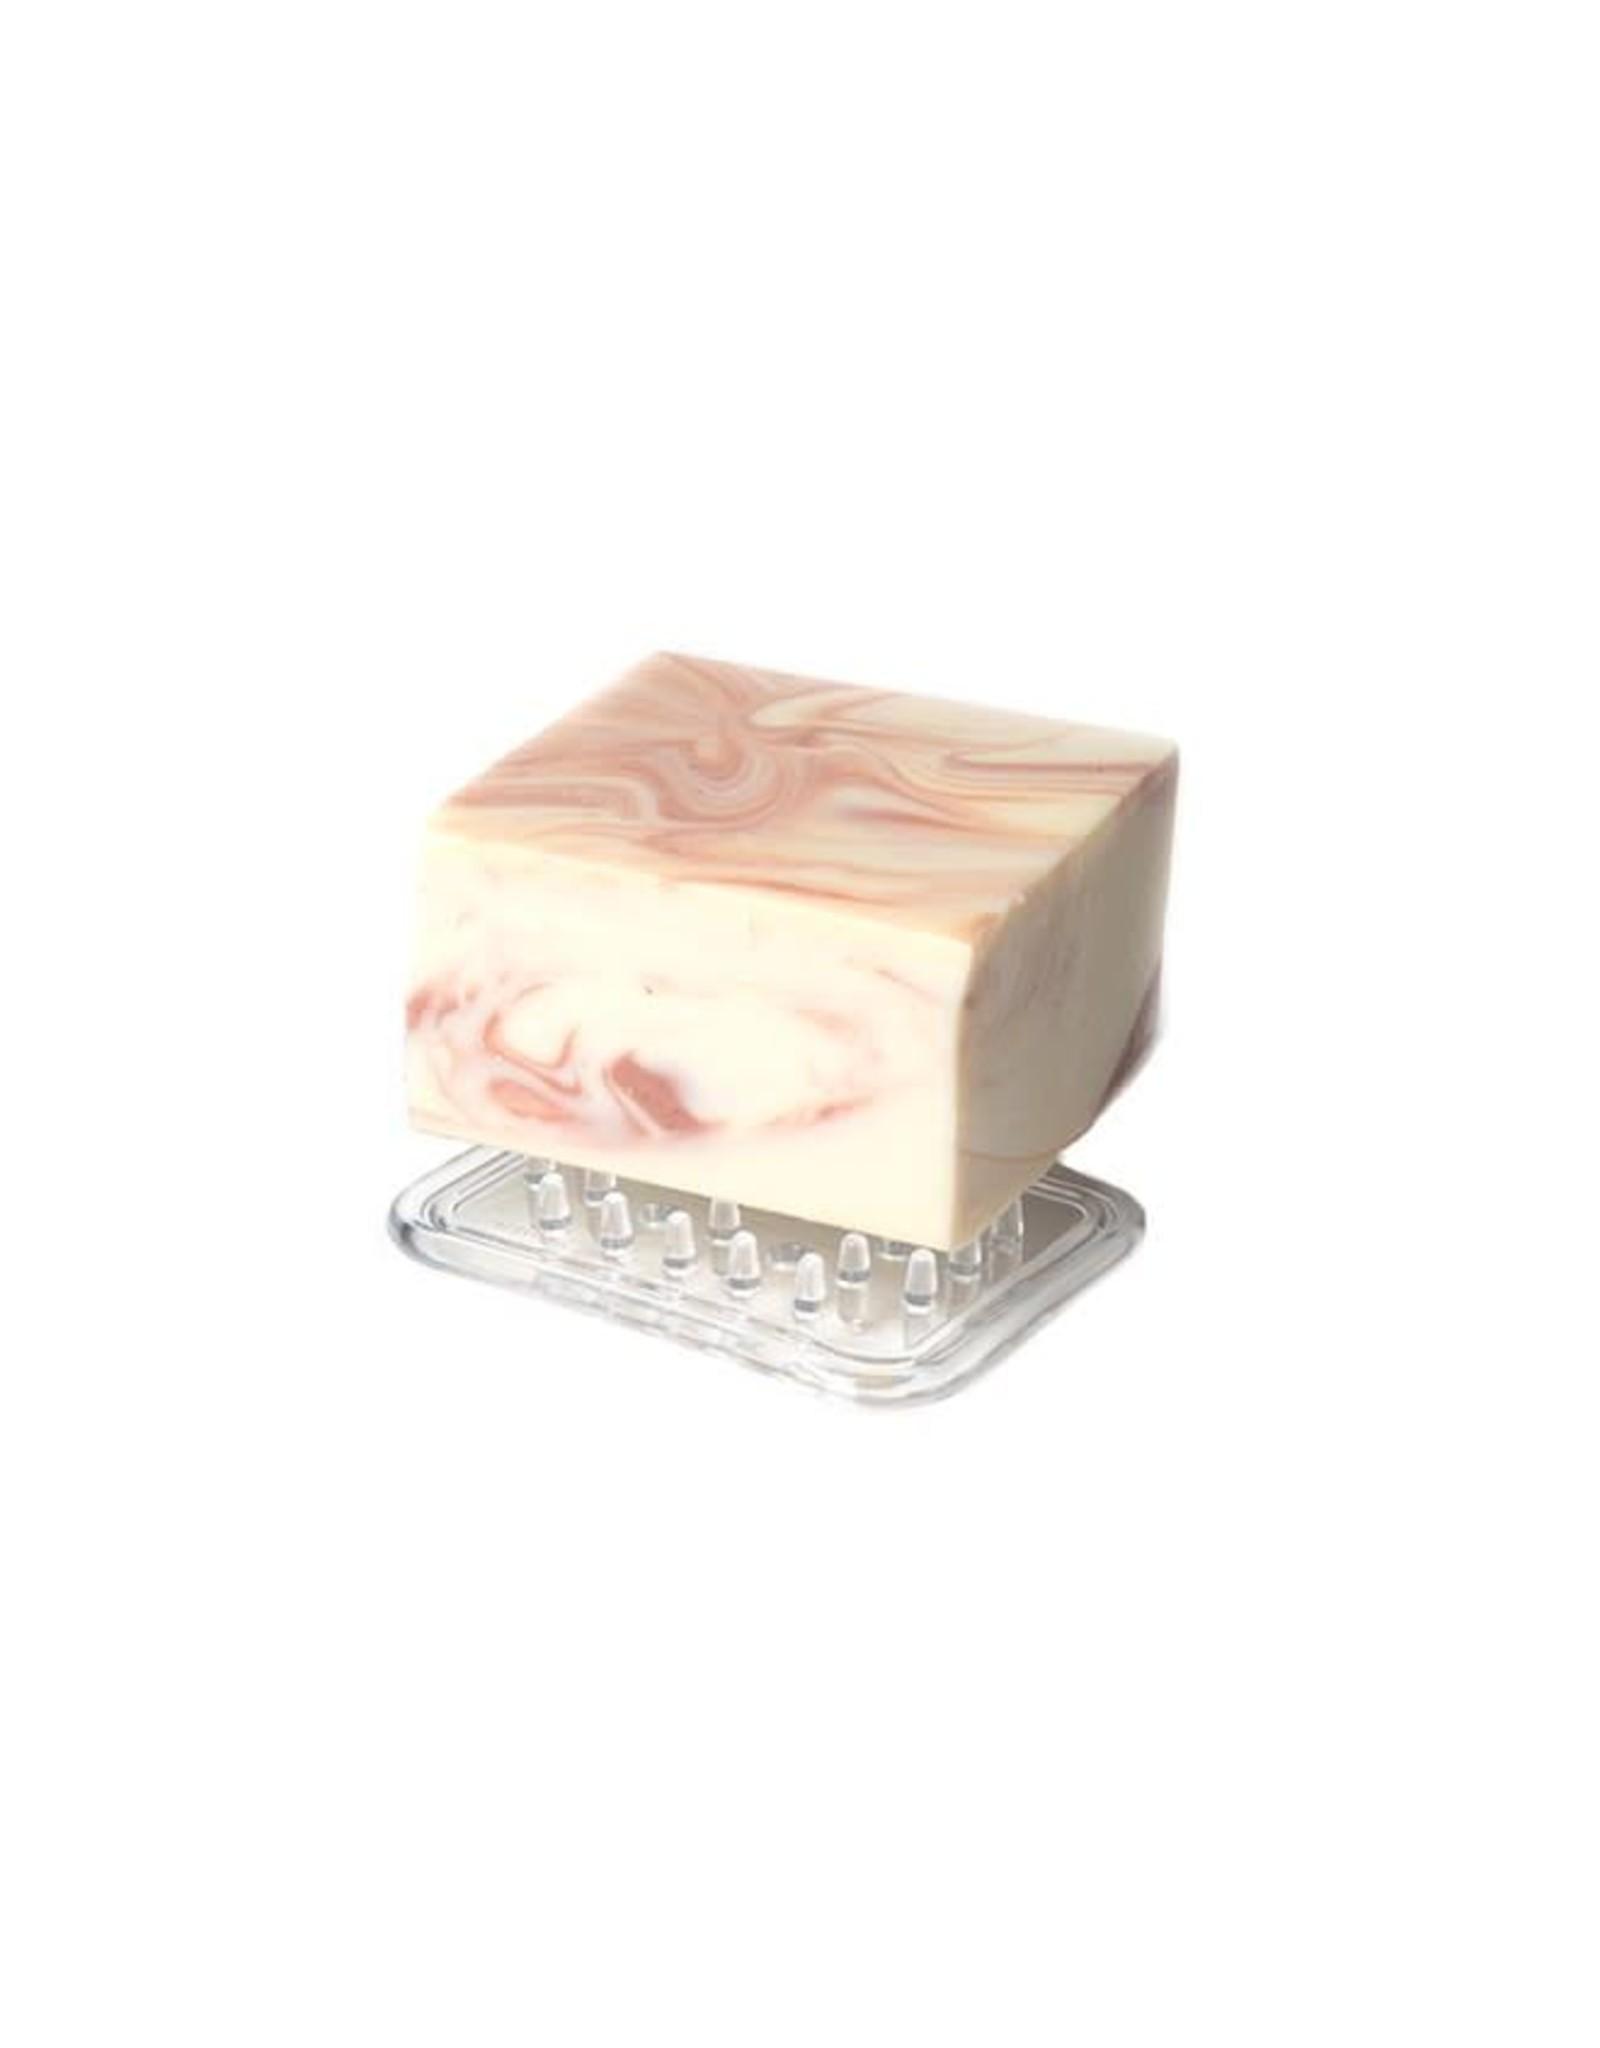 Sallye Ander Soap Saver Dish